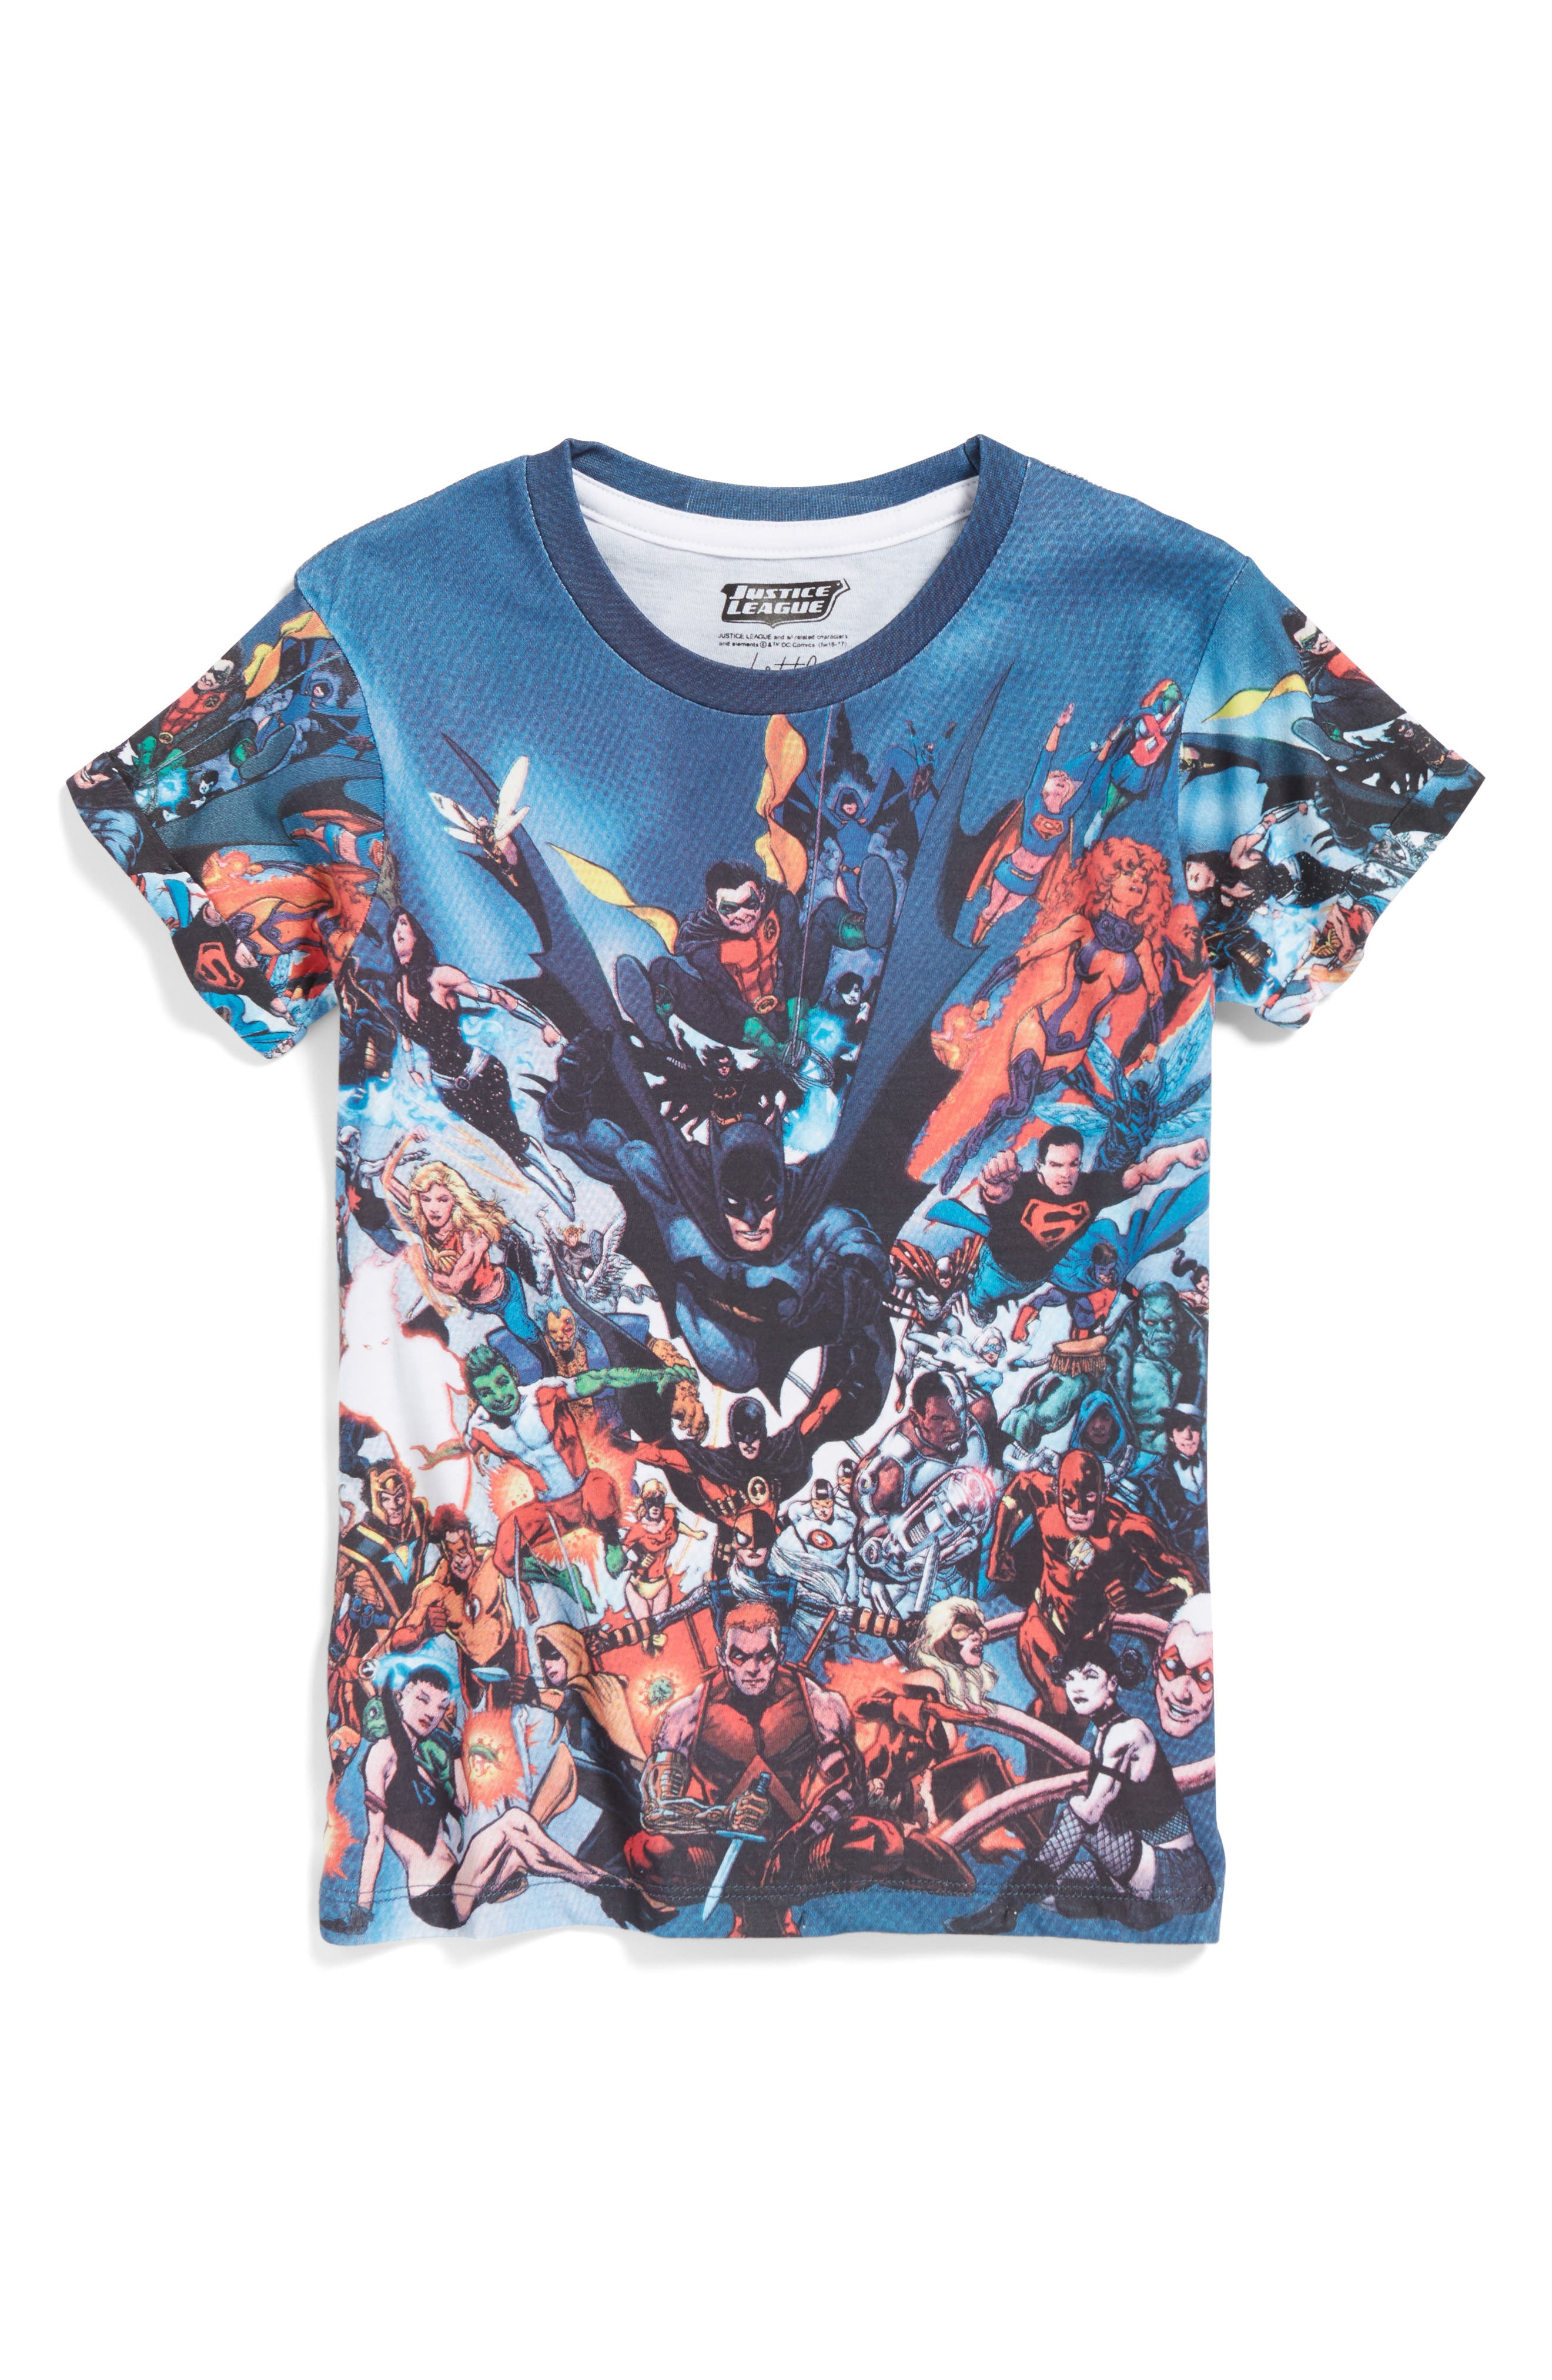 Alternate Image 1 Selected - Little ELEVENPARIS Justice League Superhero T-Shirt (Toddler Boys, Little Boys & Big Boys)